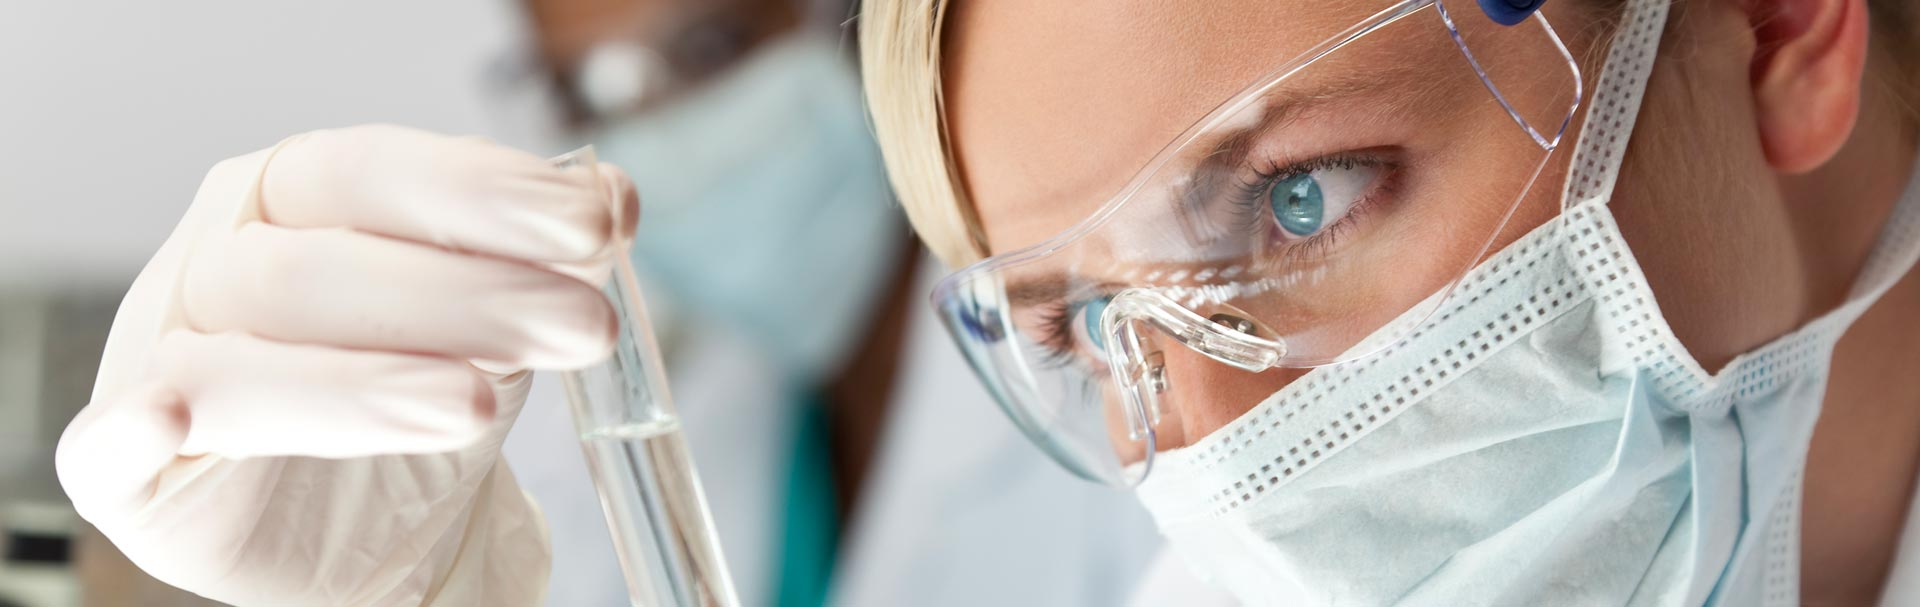 Dentist doing biocompatibility testing